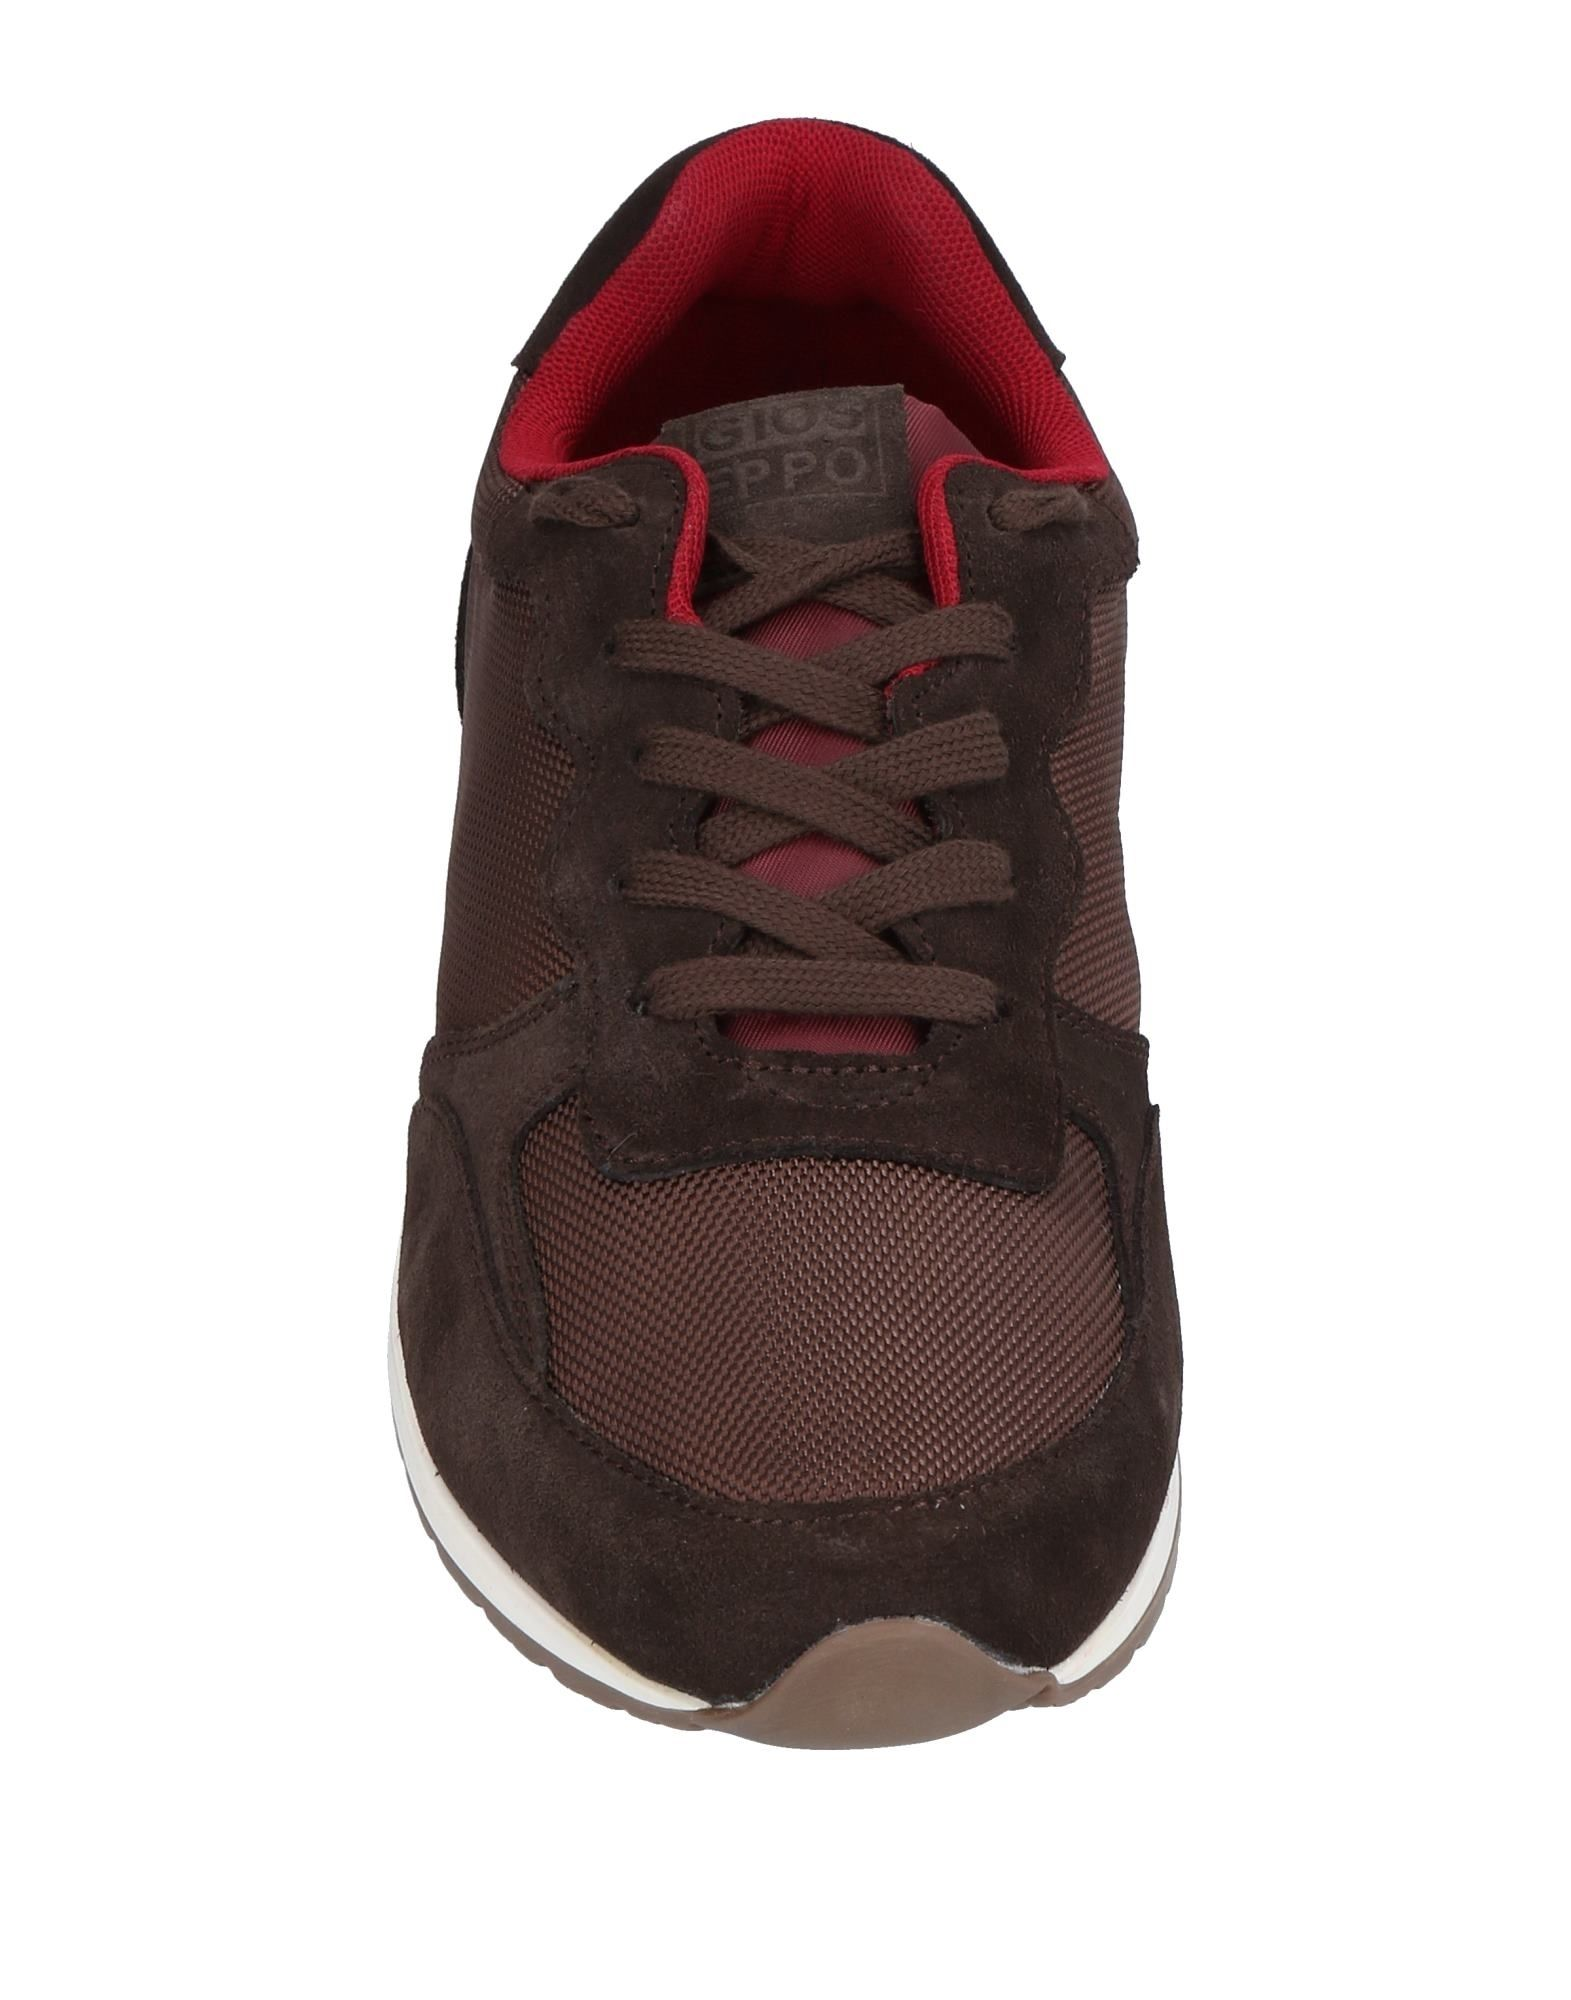 Moda Sneakers Gioseppo Uomo - 11461833VX